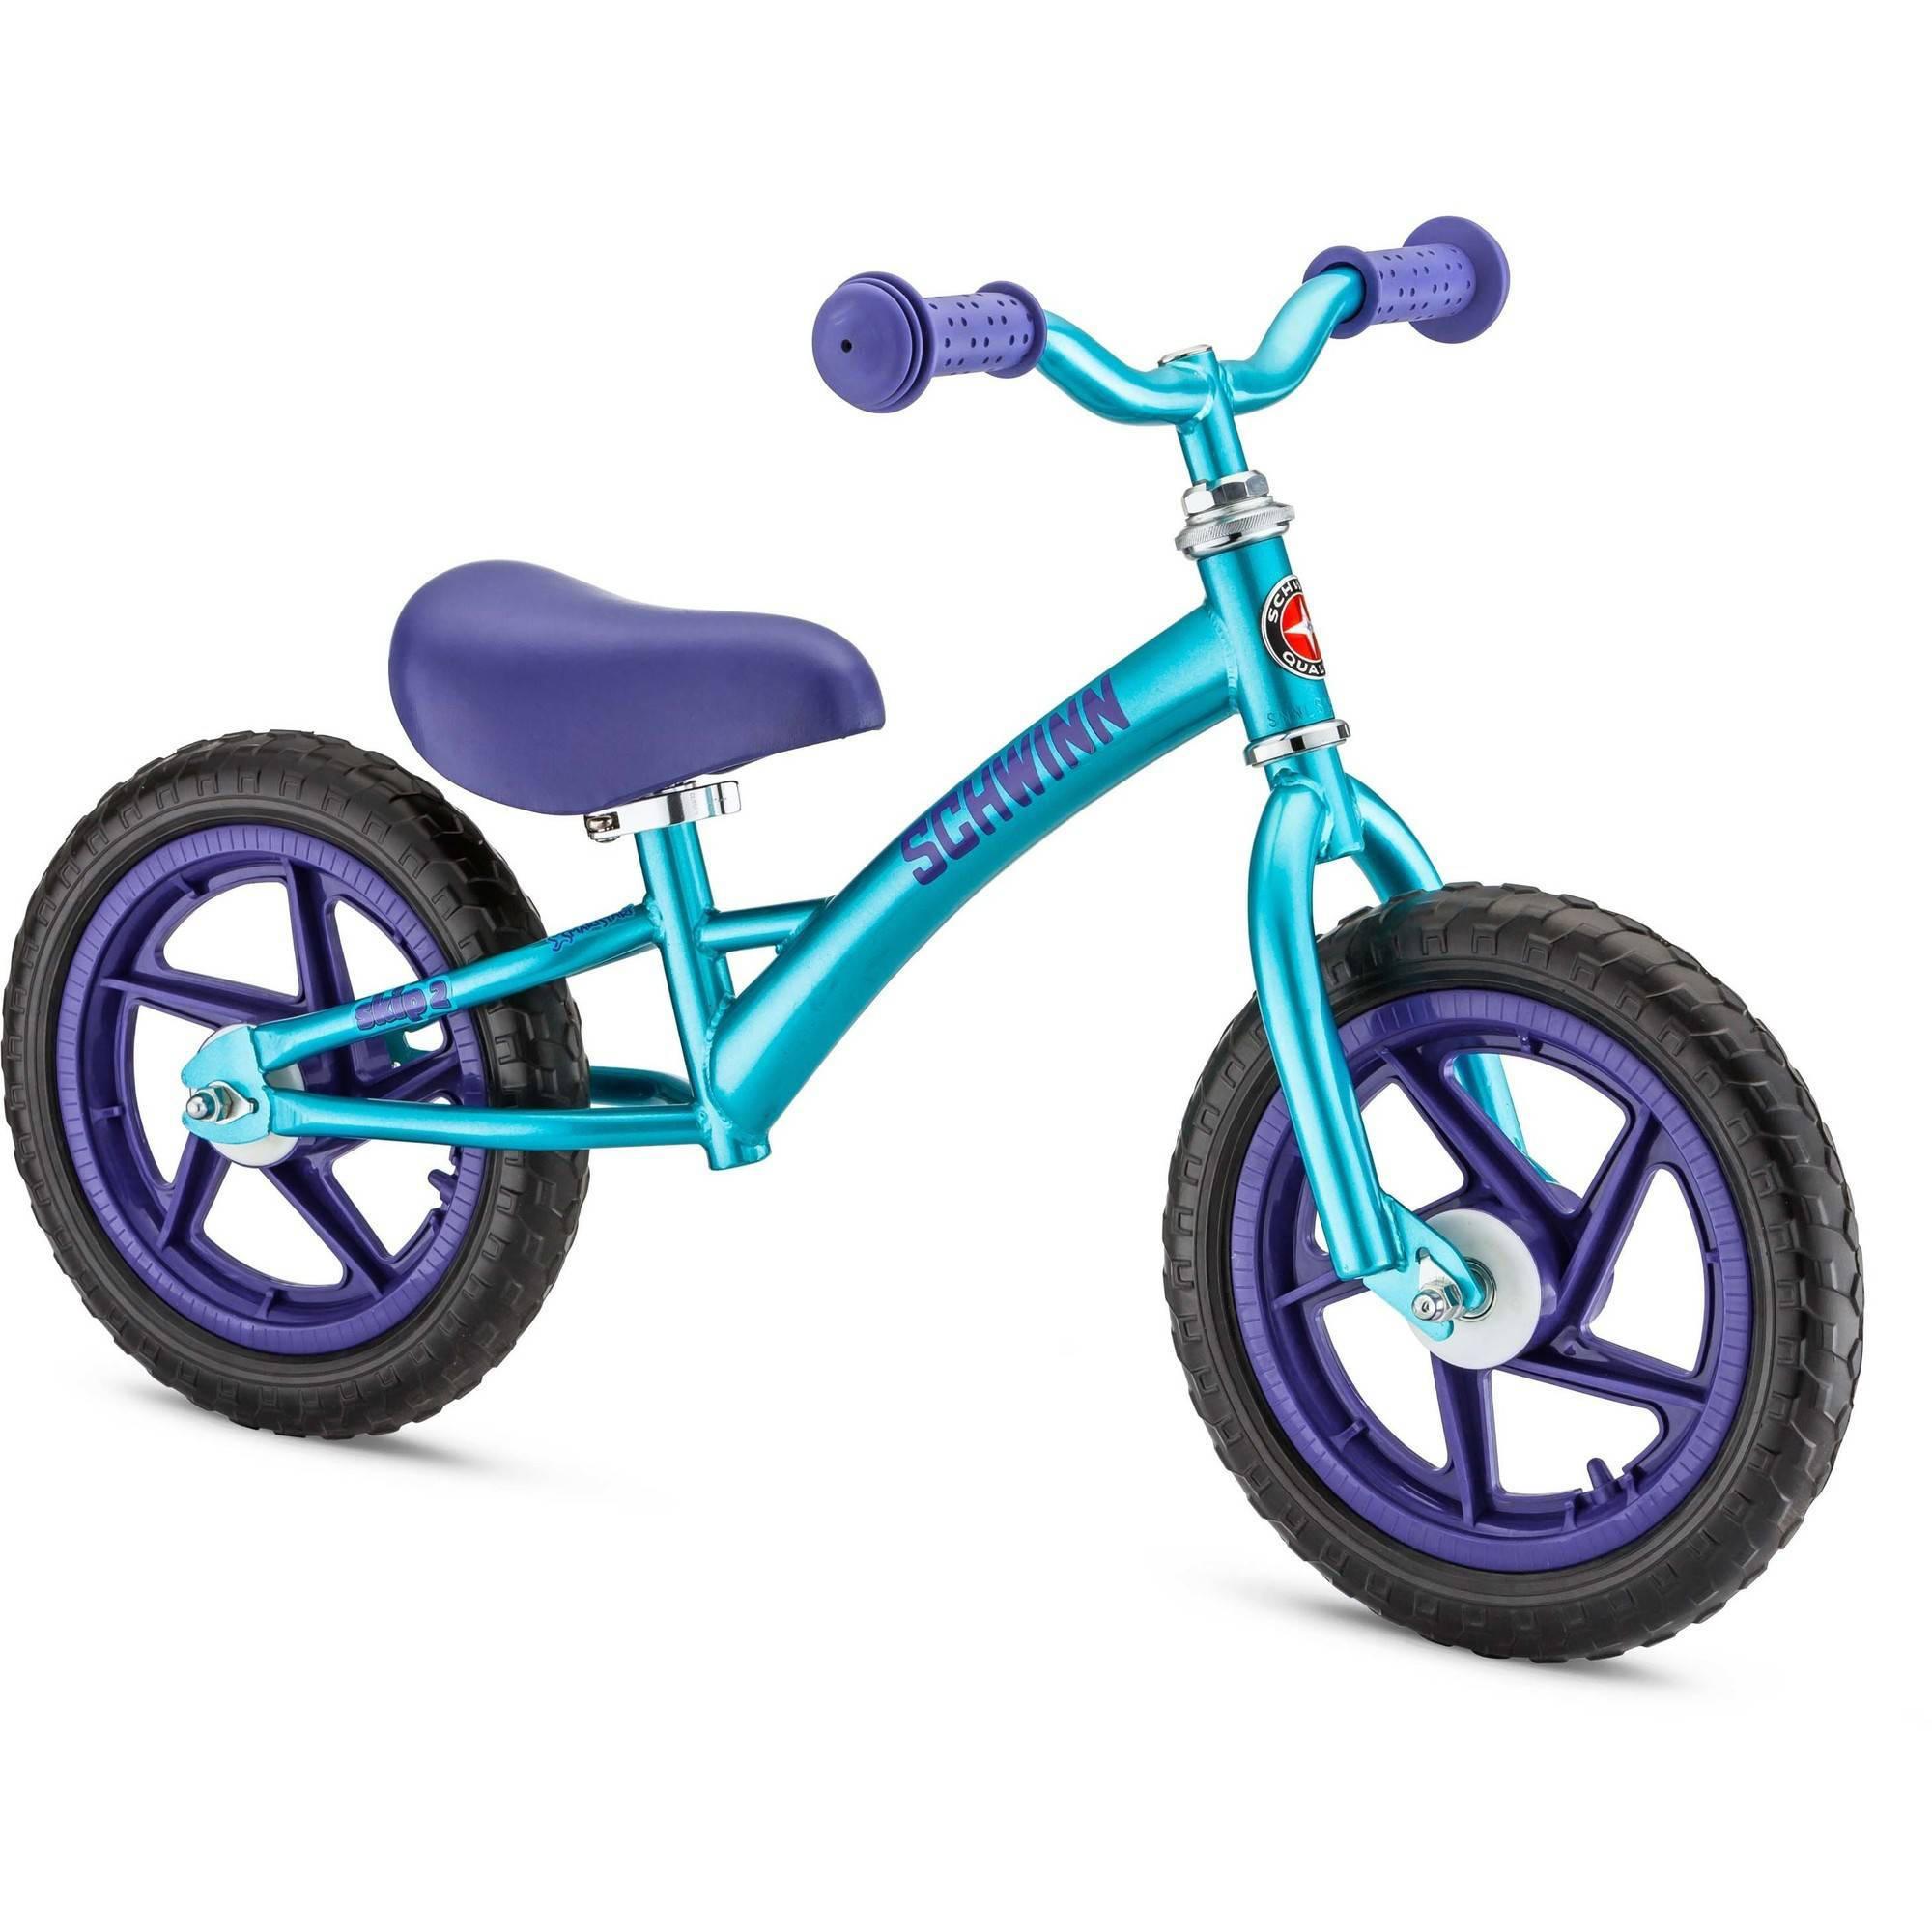 Bicicleta Para Niño(A) Schwinn Skip 2 bici del Balance, Teal + Schwinn en Veo y Compro